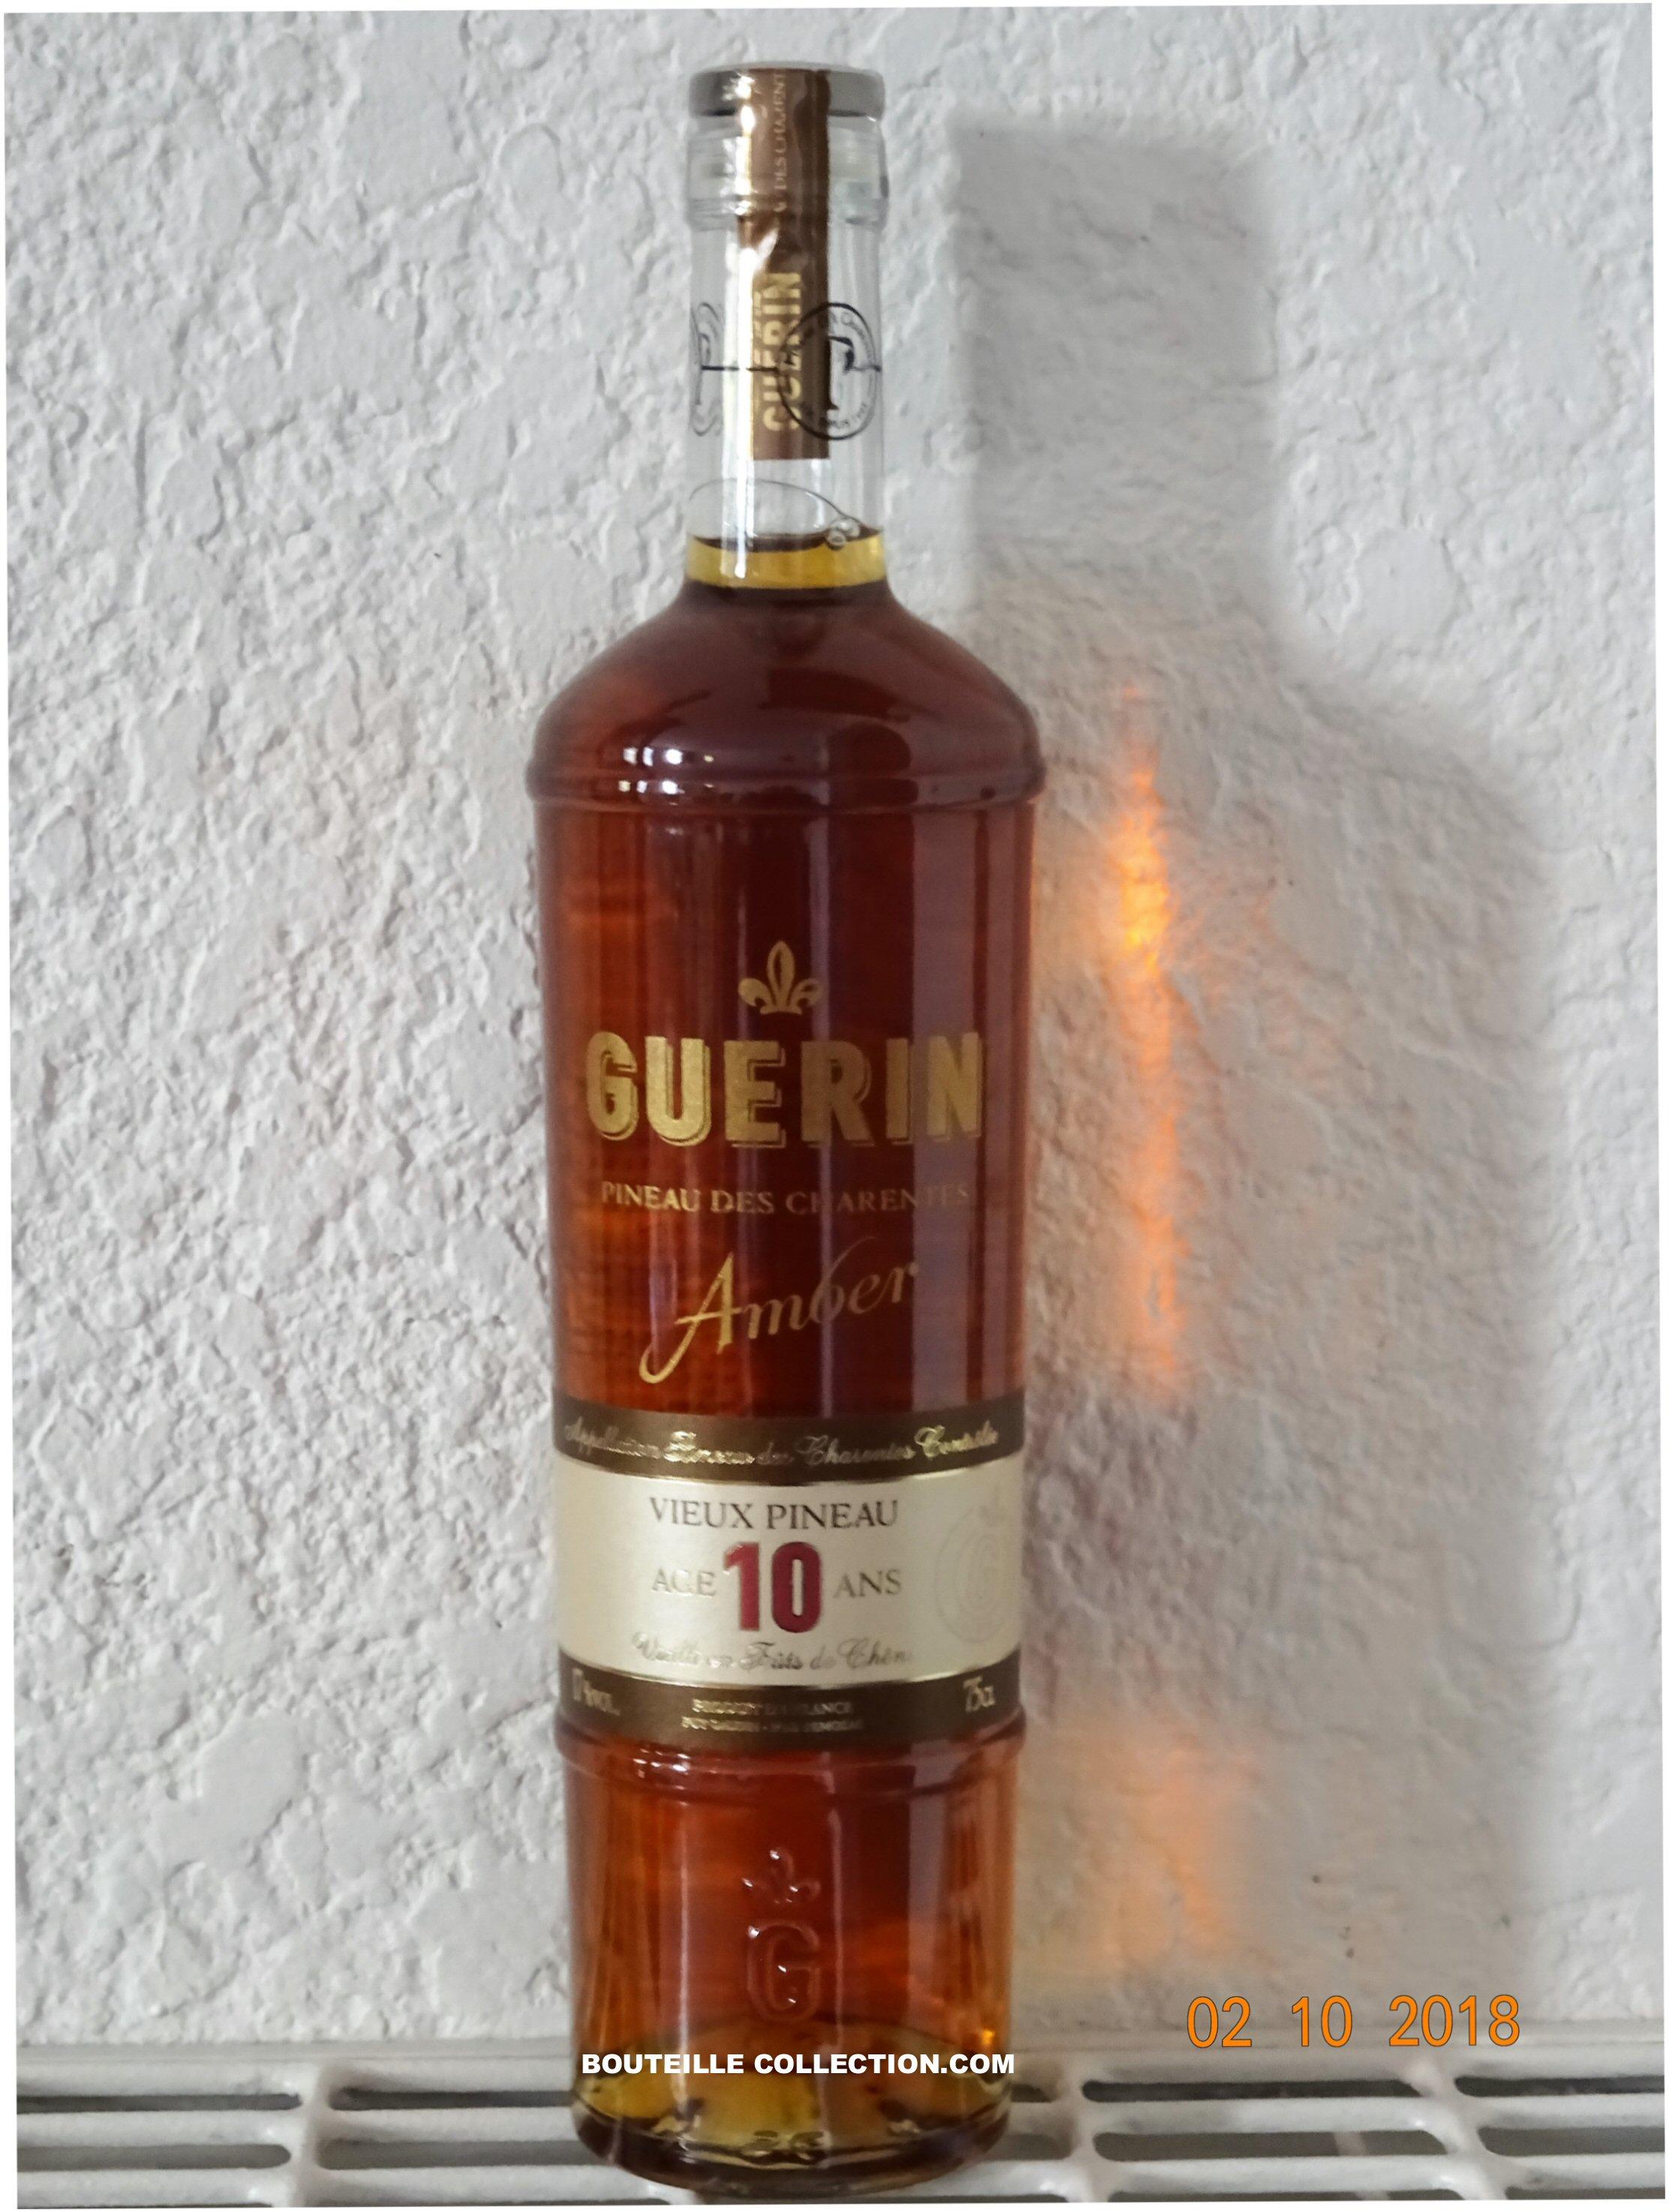 GUERIN 70CL B  .JPG